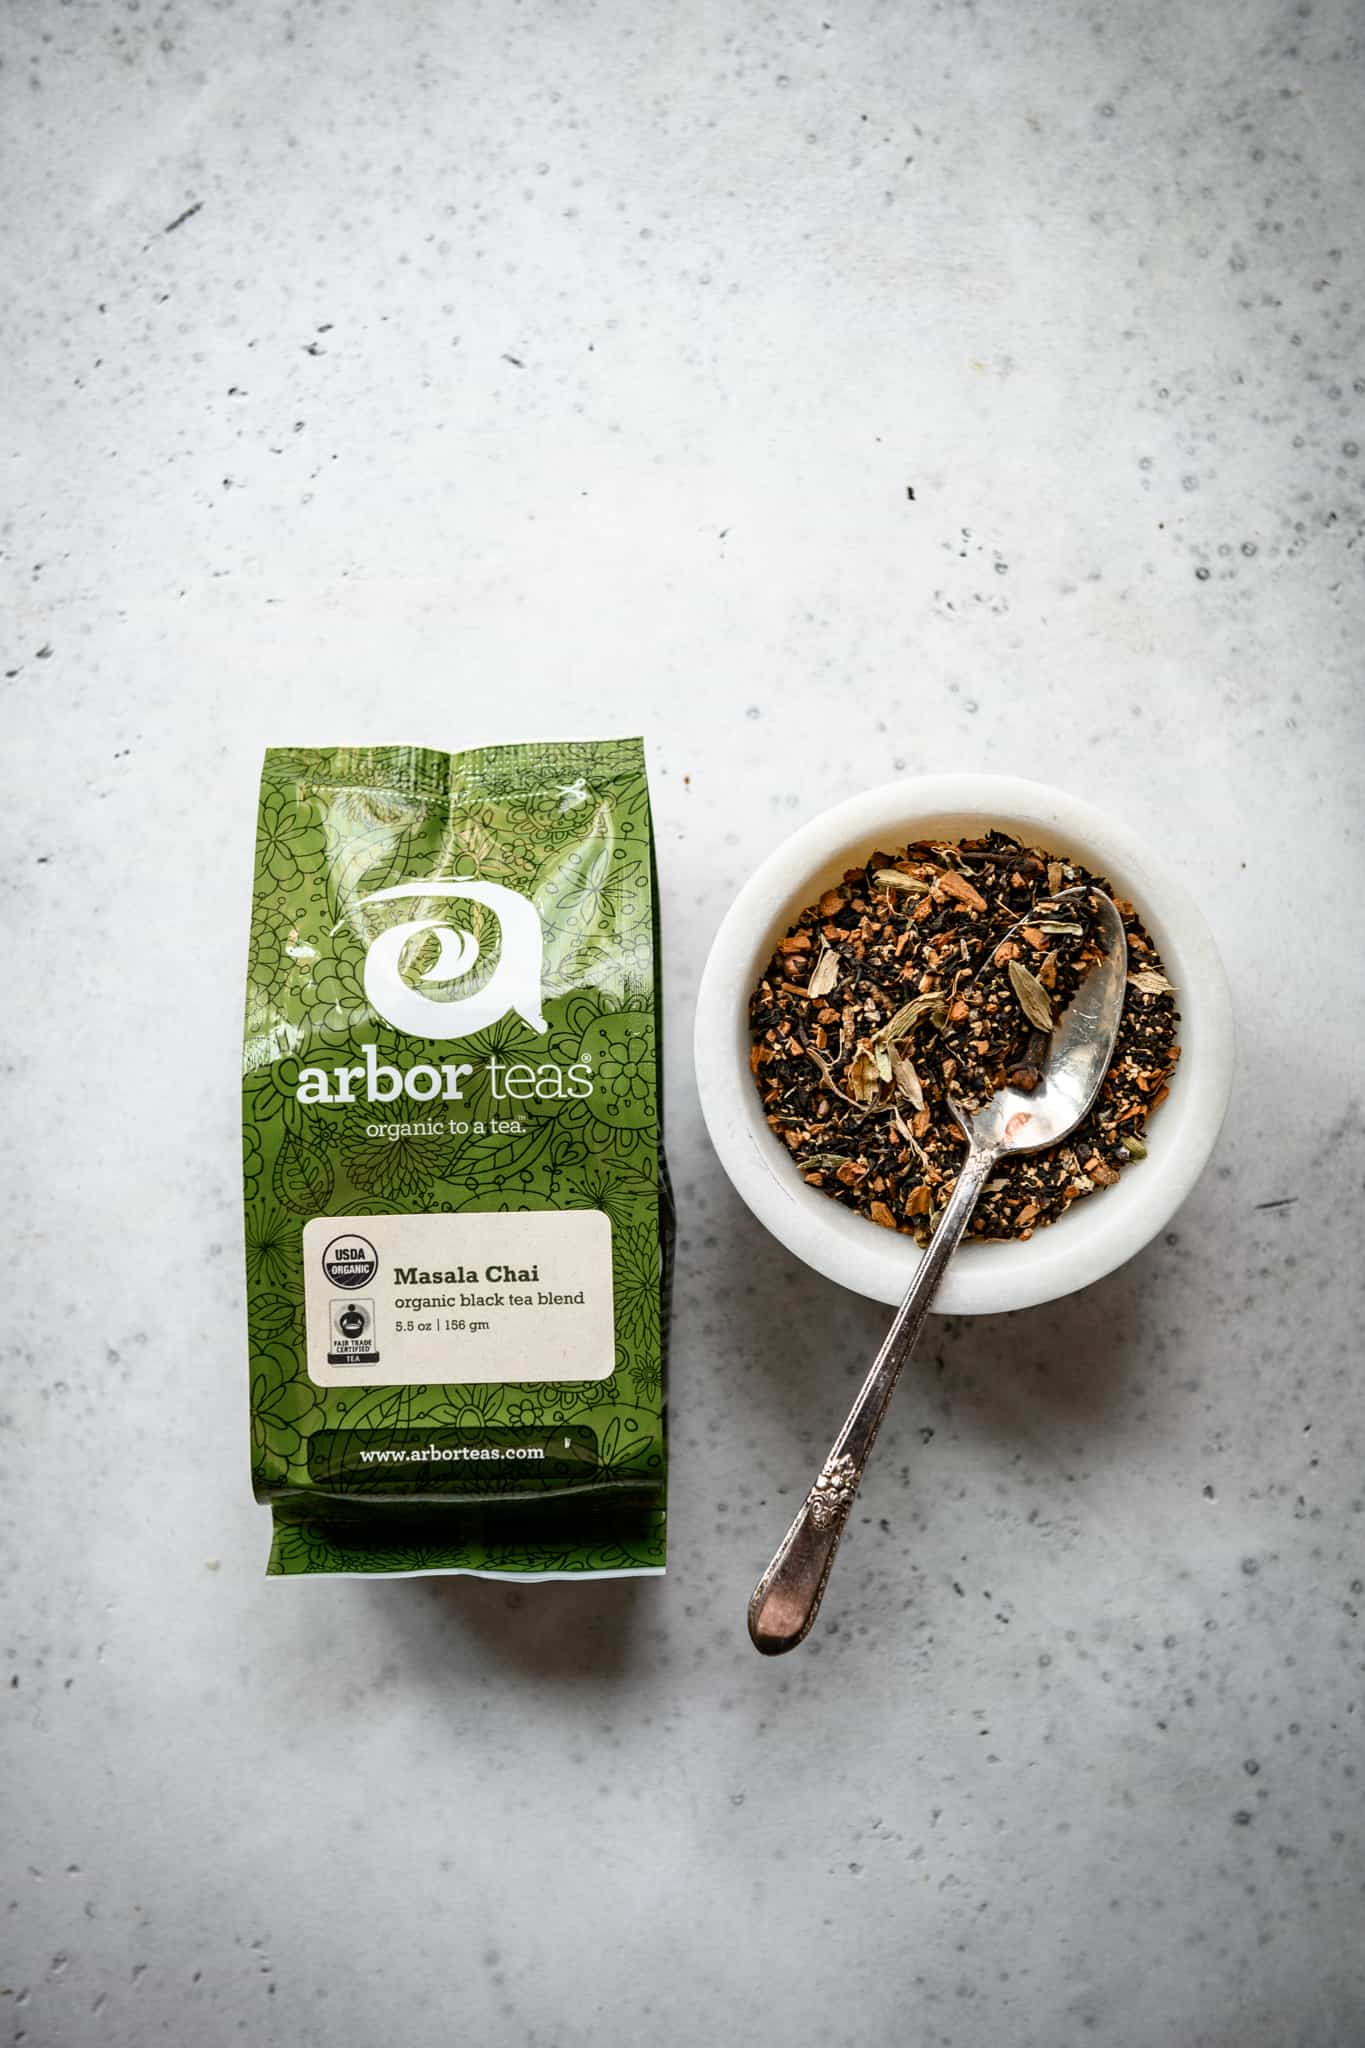 overhead view of Arbor Teas Masala Chai Tea in bag